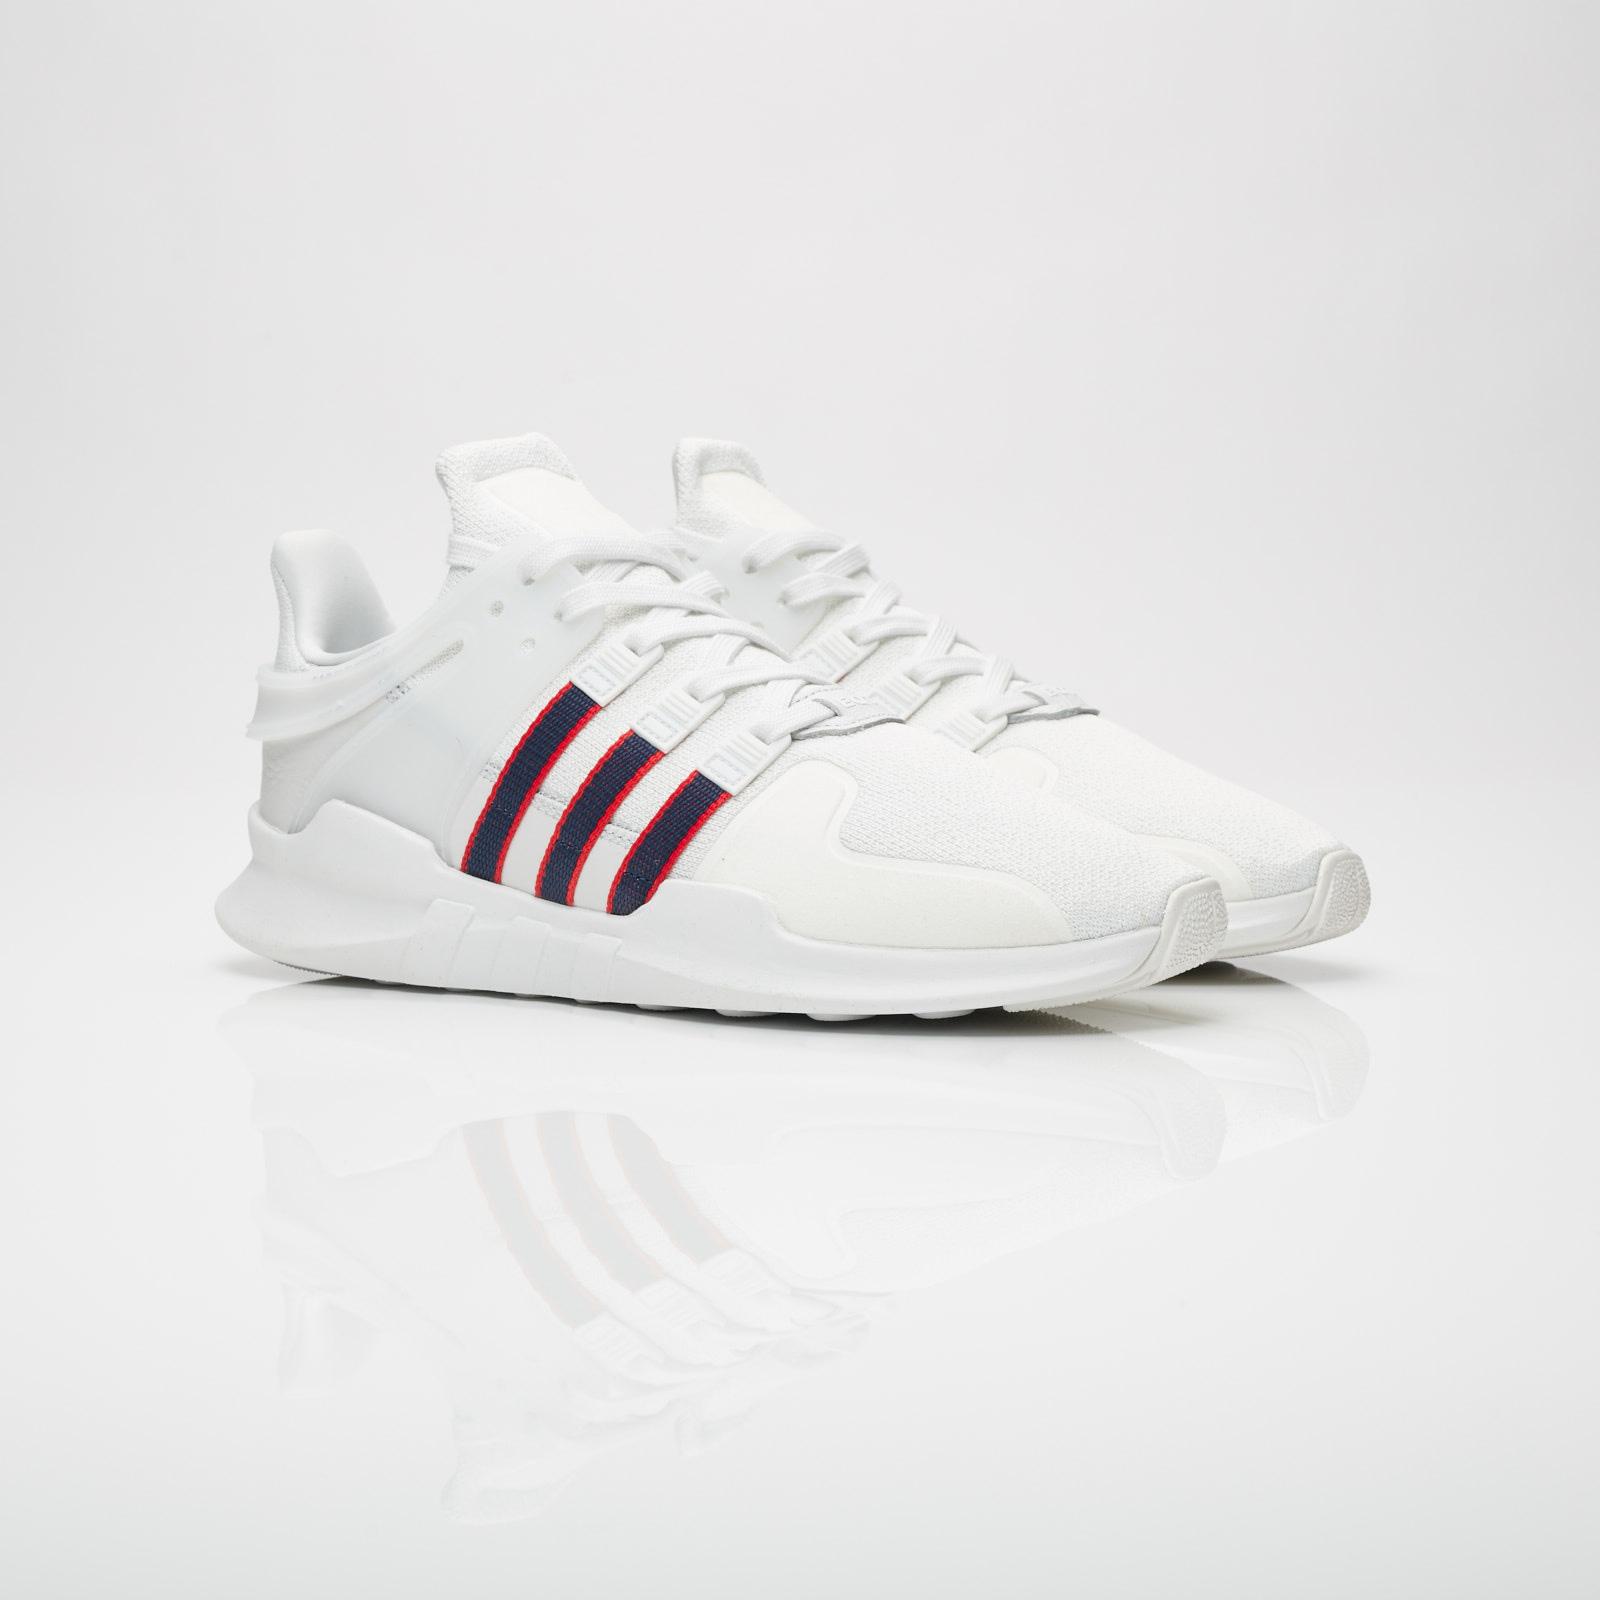 103527062309 adidas EQT Support ADV - Bb6778 - Sneakersnstuff